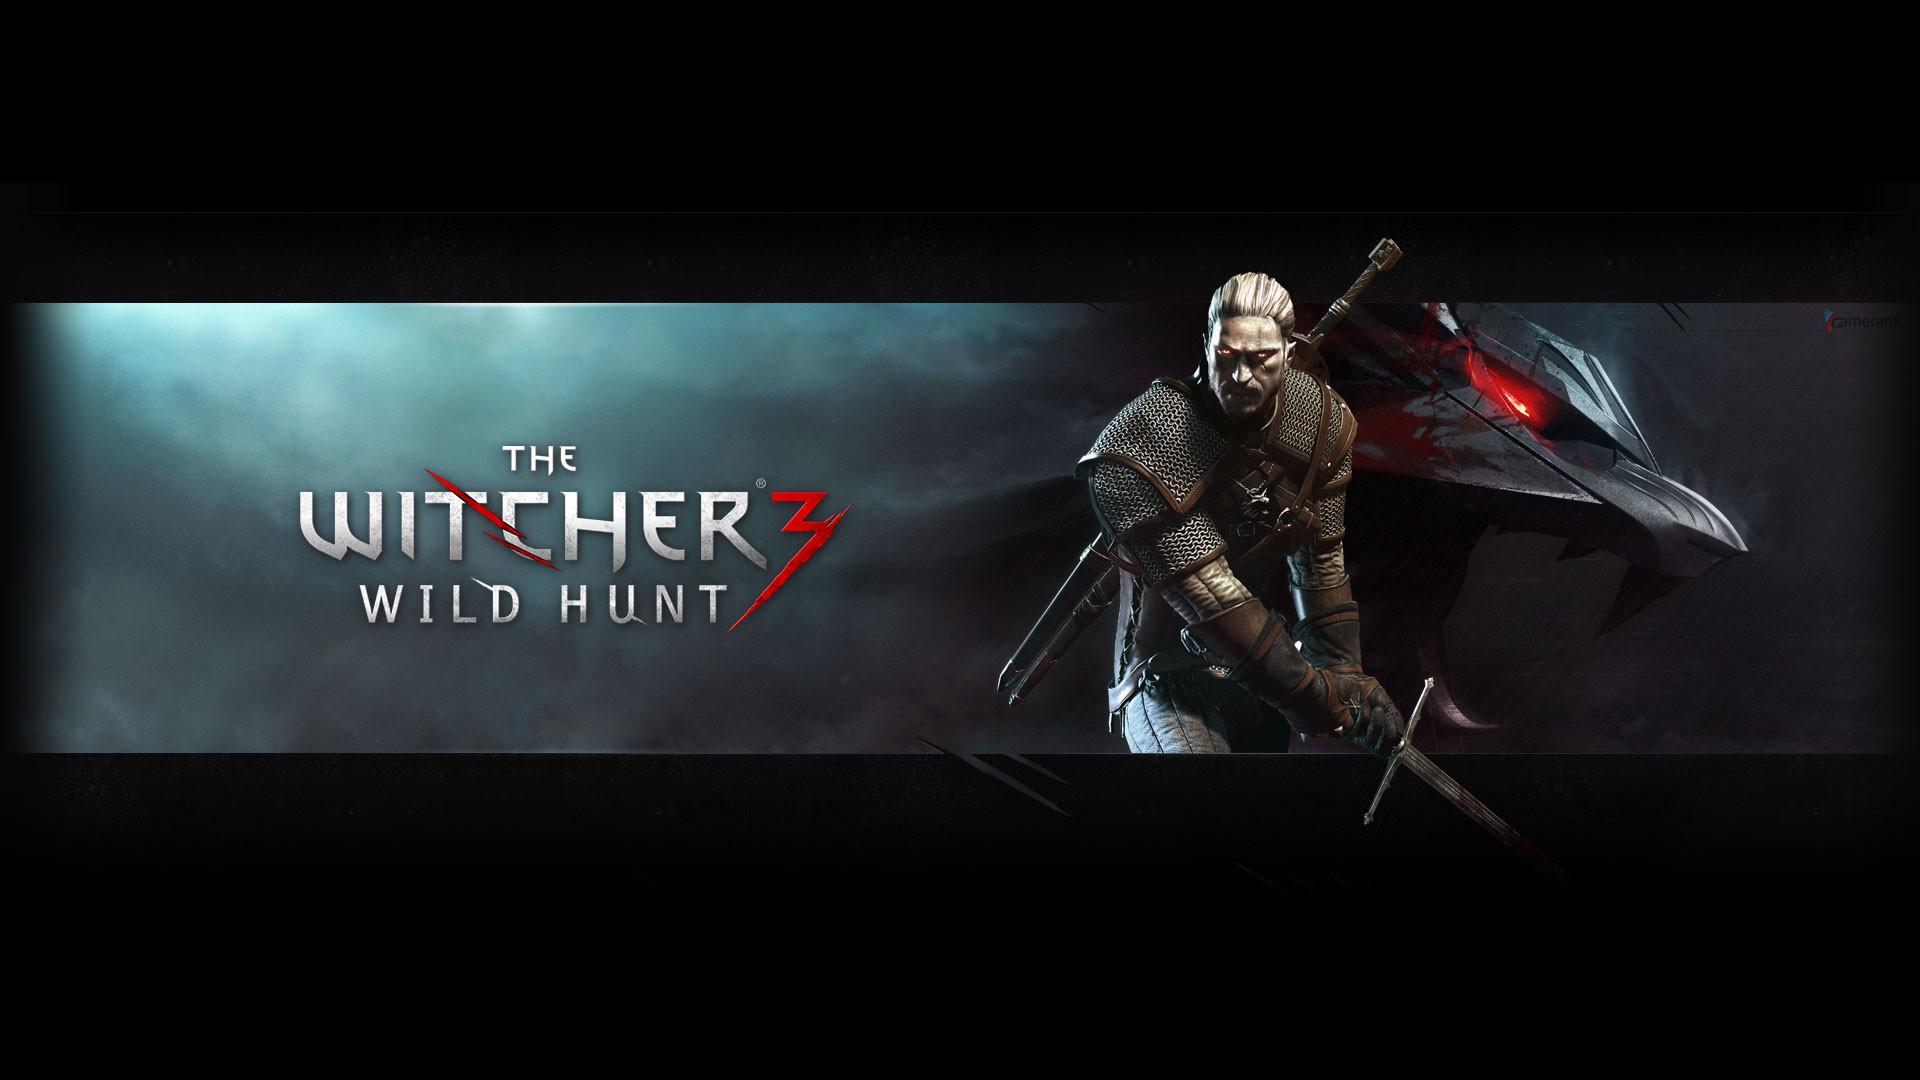 Witcher 3: Wild Hunt 1080p Wallpaper